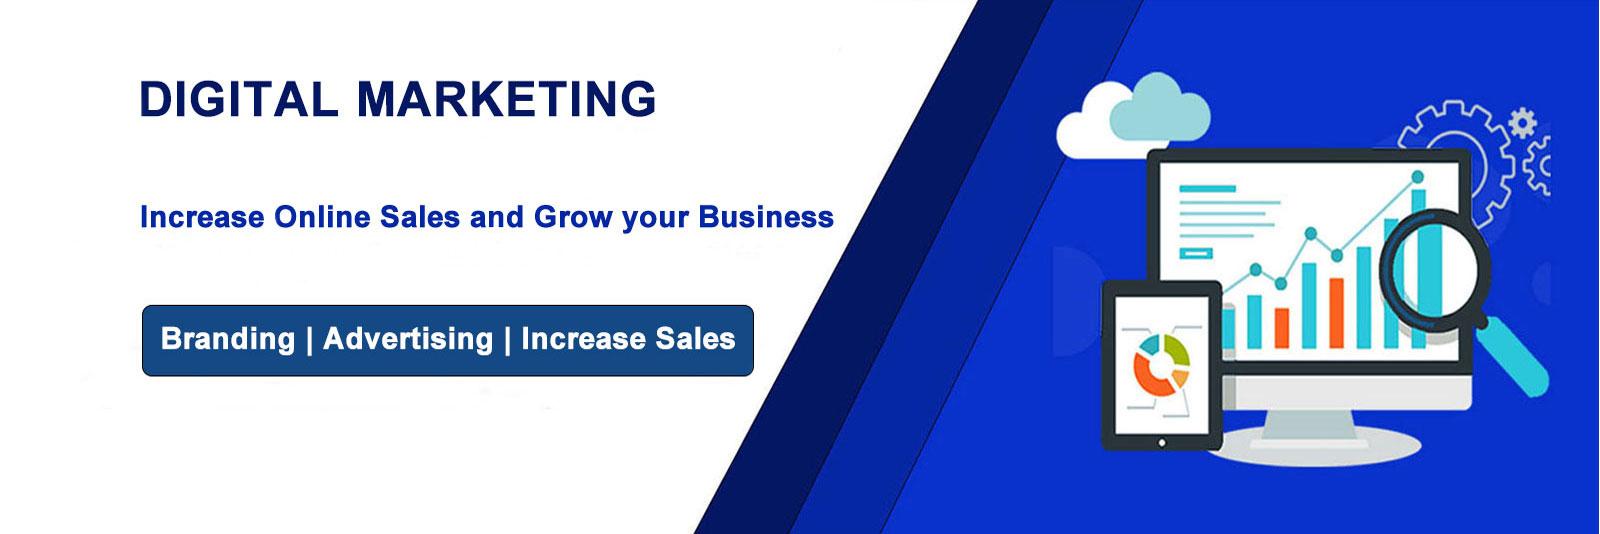 Web Design and Digital Marketing Company in Kolkata, India - Arkon